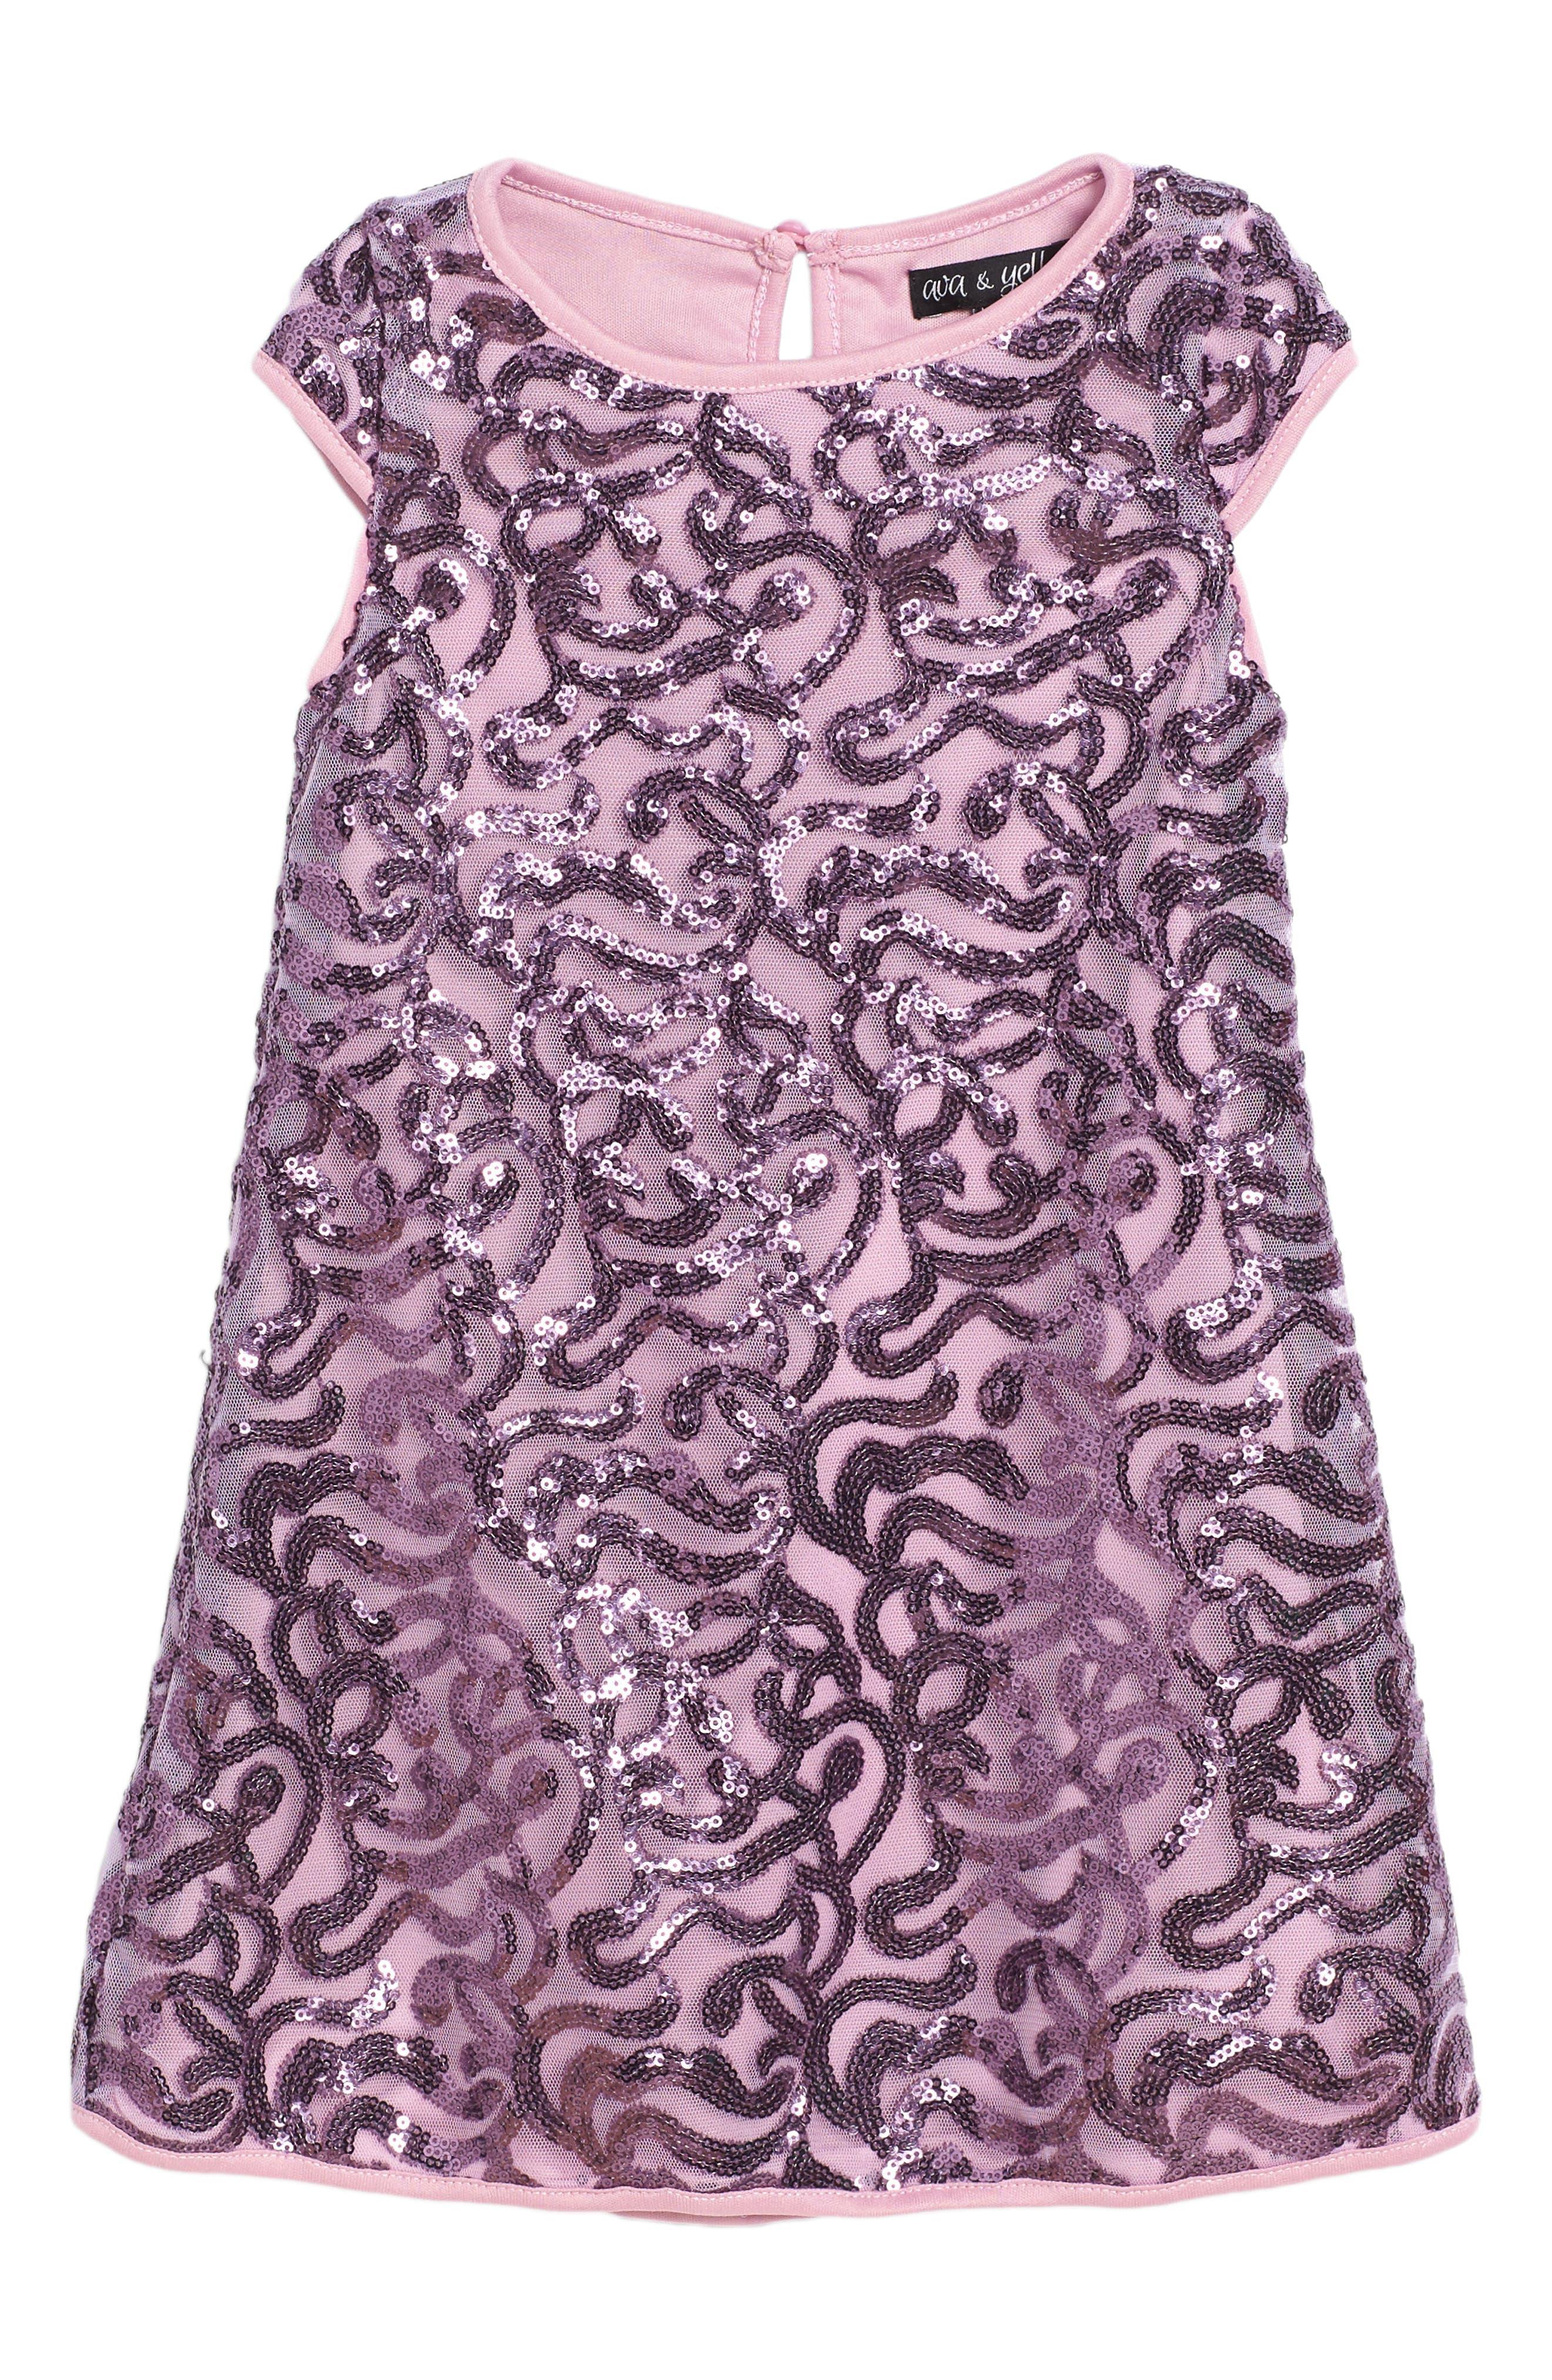 Sequin Swirl Shift Dress,                             Main thumbnail 1, color,                             530